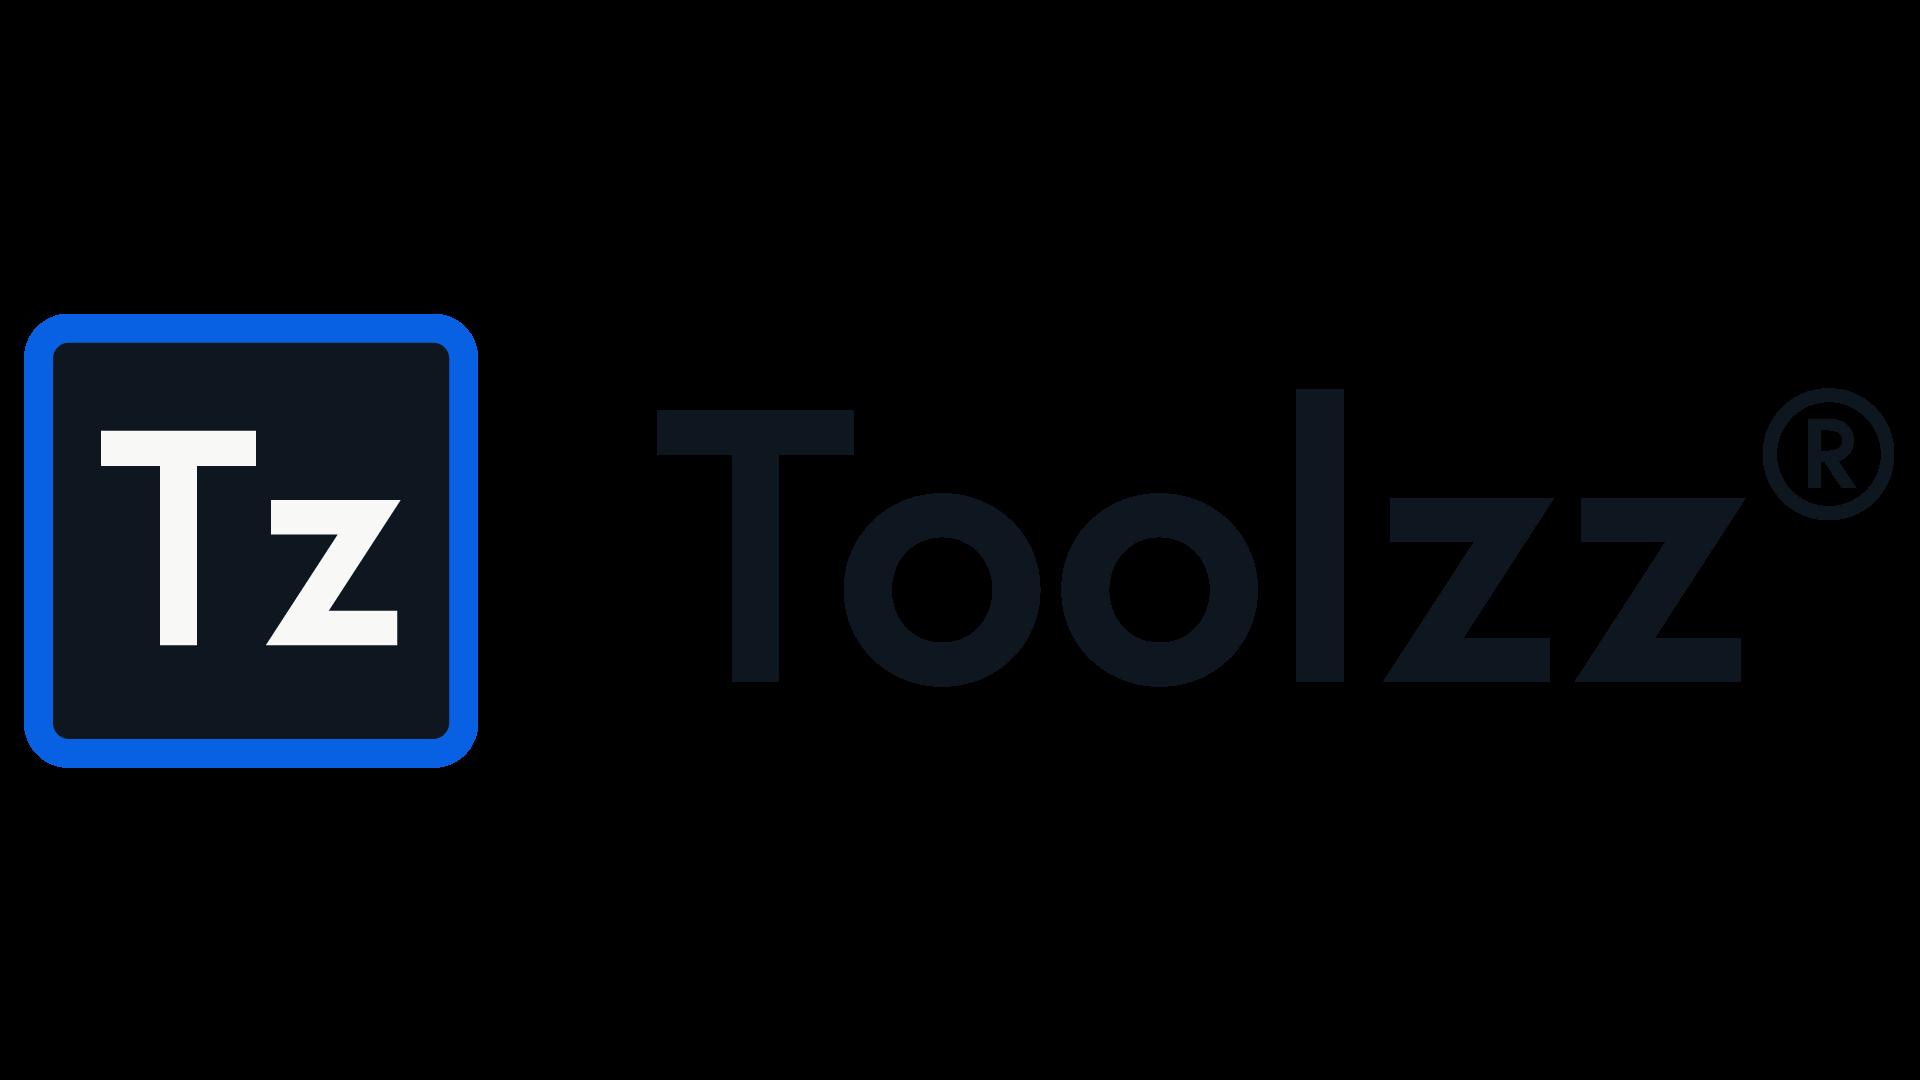 Toolzz